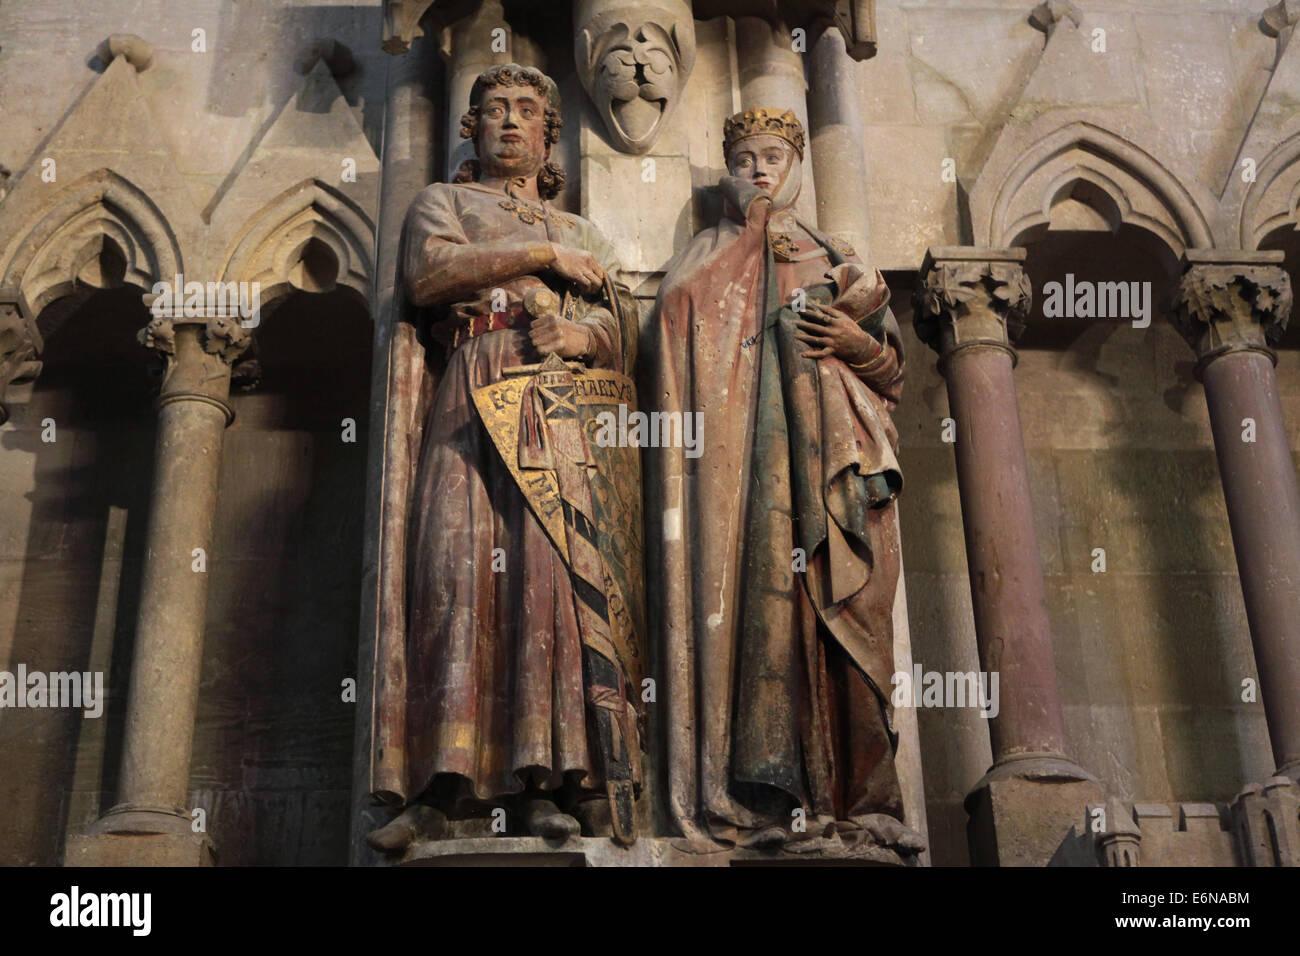 Statue gotiche del Margravio Eckard II e sua moglie Uta di Naumburg Cattedrale di Naumburg, Sassonia Anhalt, Germania. Immagini Stock